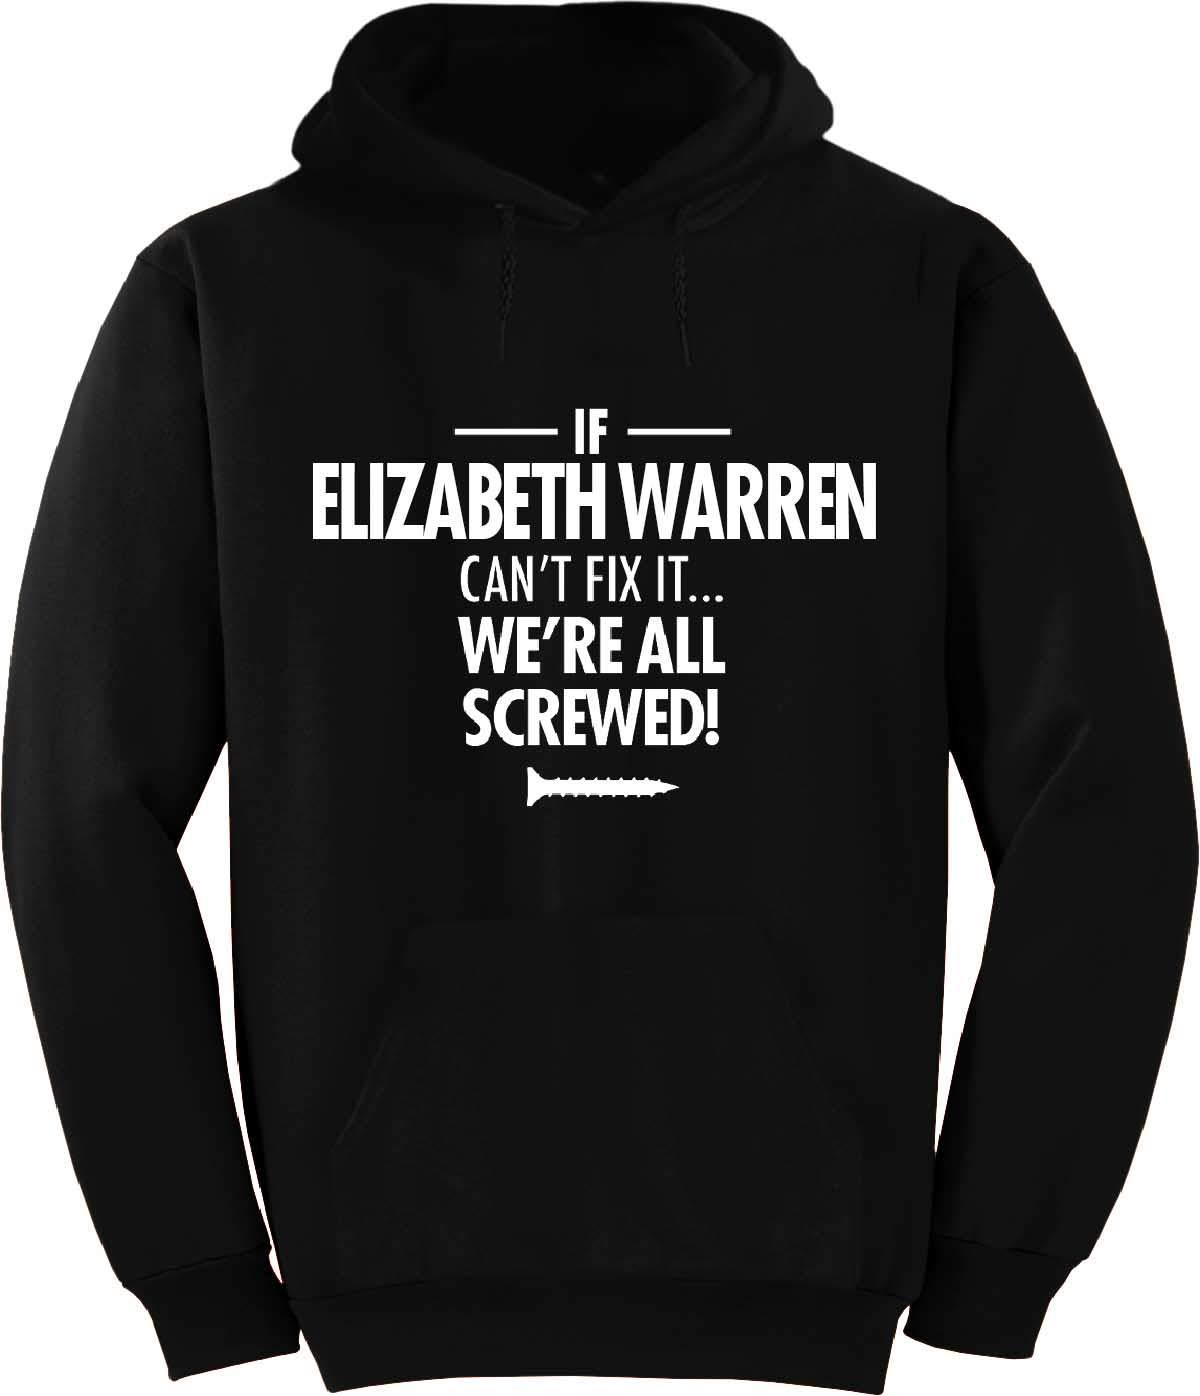 If Elizabeth Warren Can't Fix it, We're All Screwed Hoodie Black